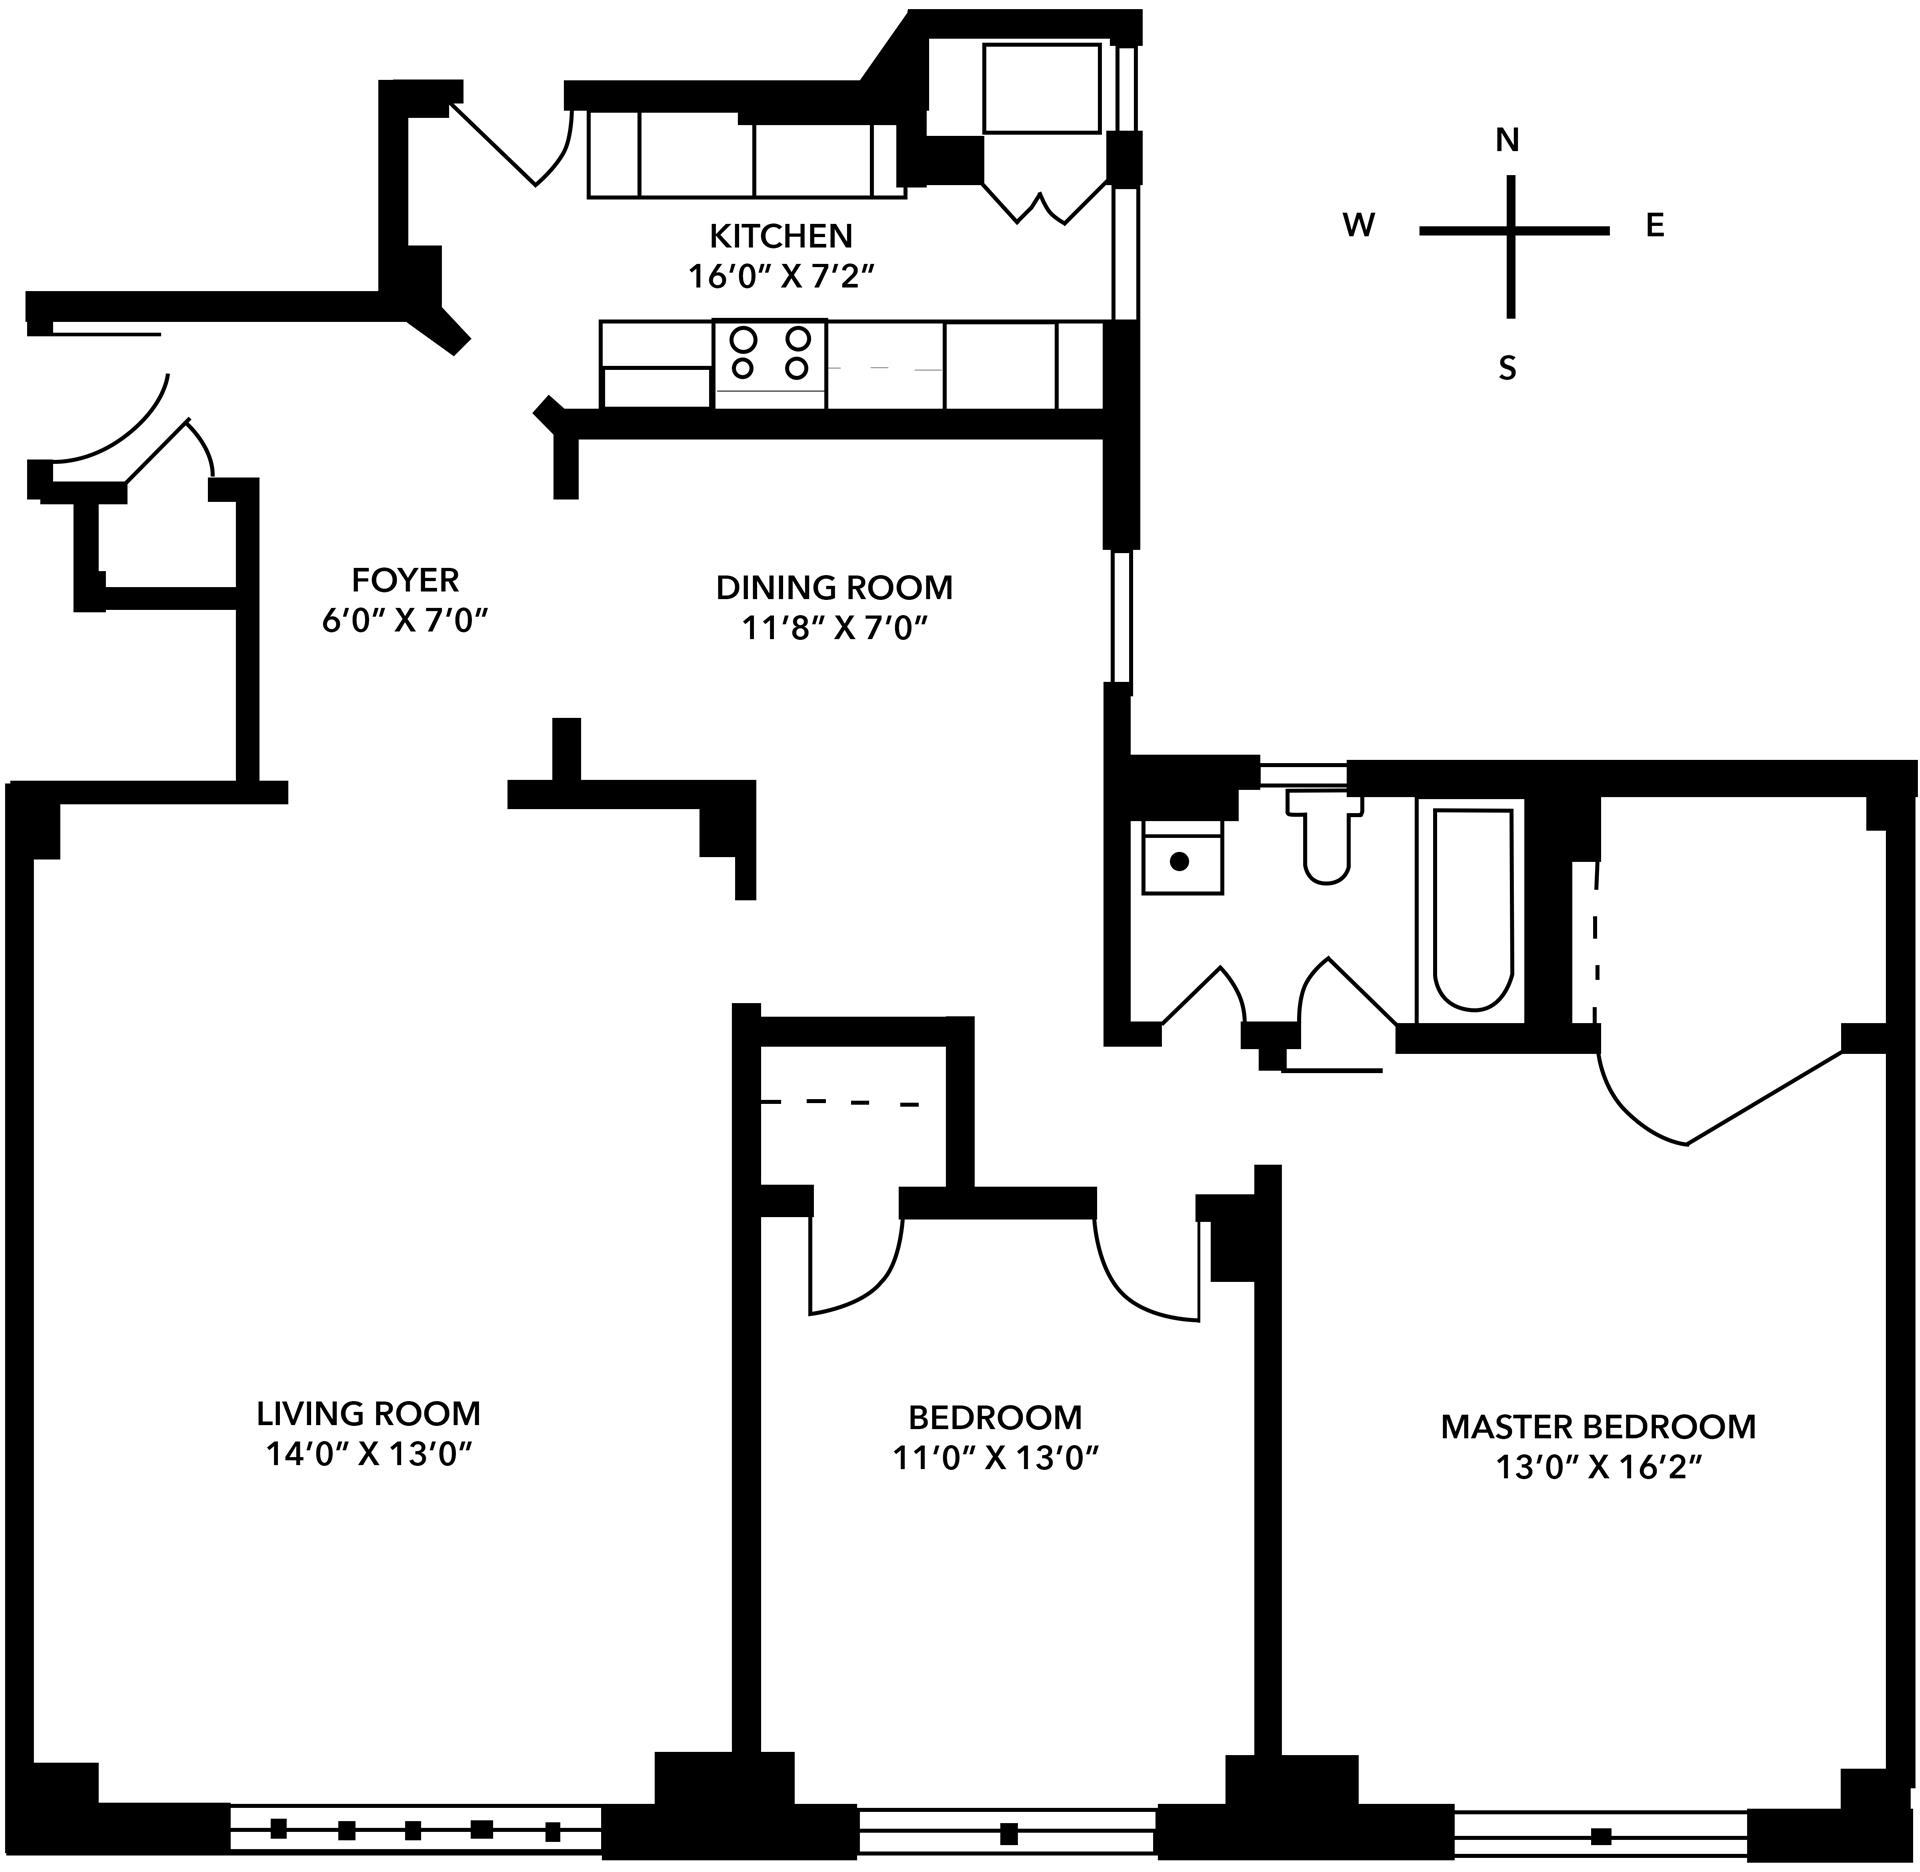 Floor plan of 325 Tenants Corp., 325 East 57th St, 9BSTU4 - Midtown, New York